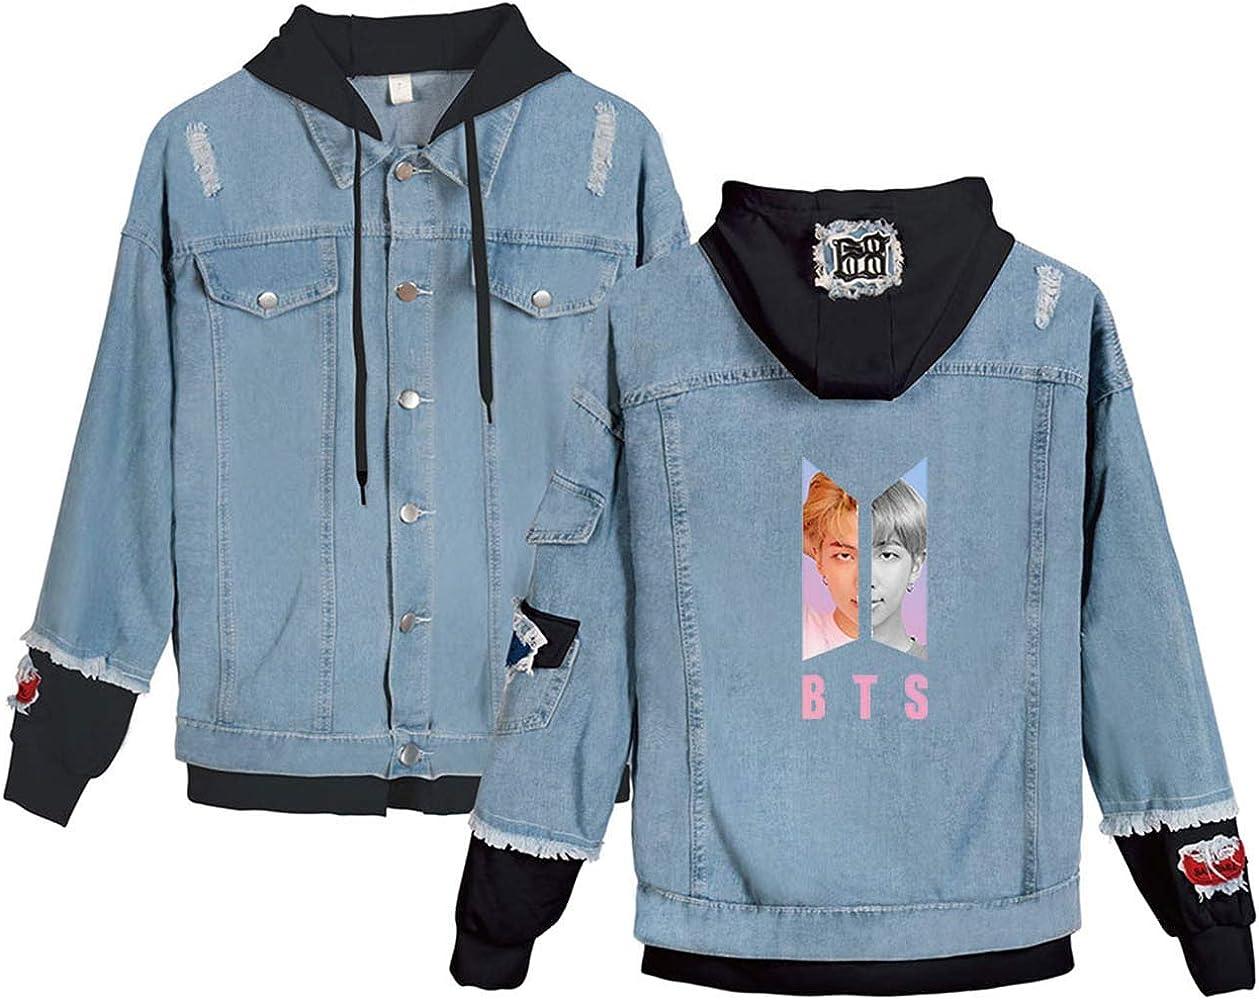 ACEFAST INC Kpop BTS Hoodie Map of The Soul 7 Sweatshirt V Jimin Suga RM Jhope Jungkook Pullover Sweater